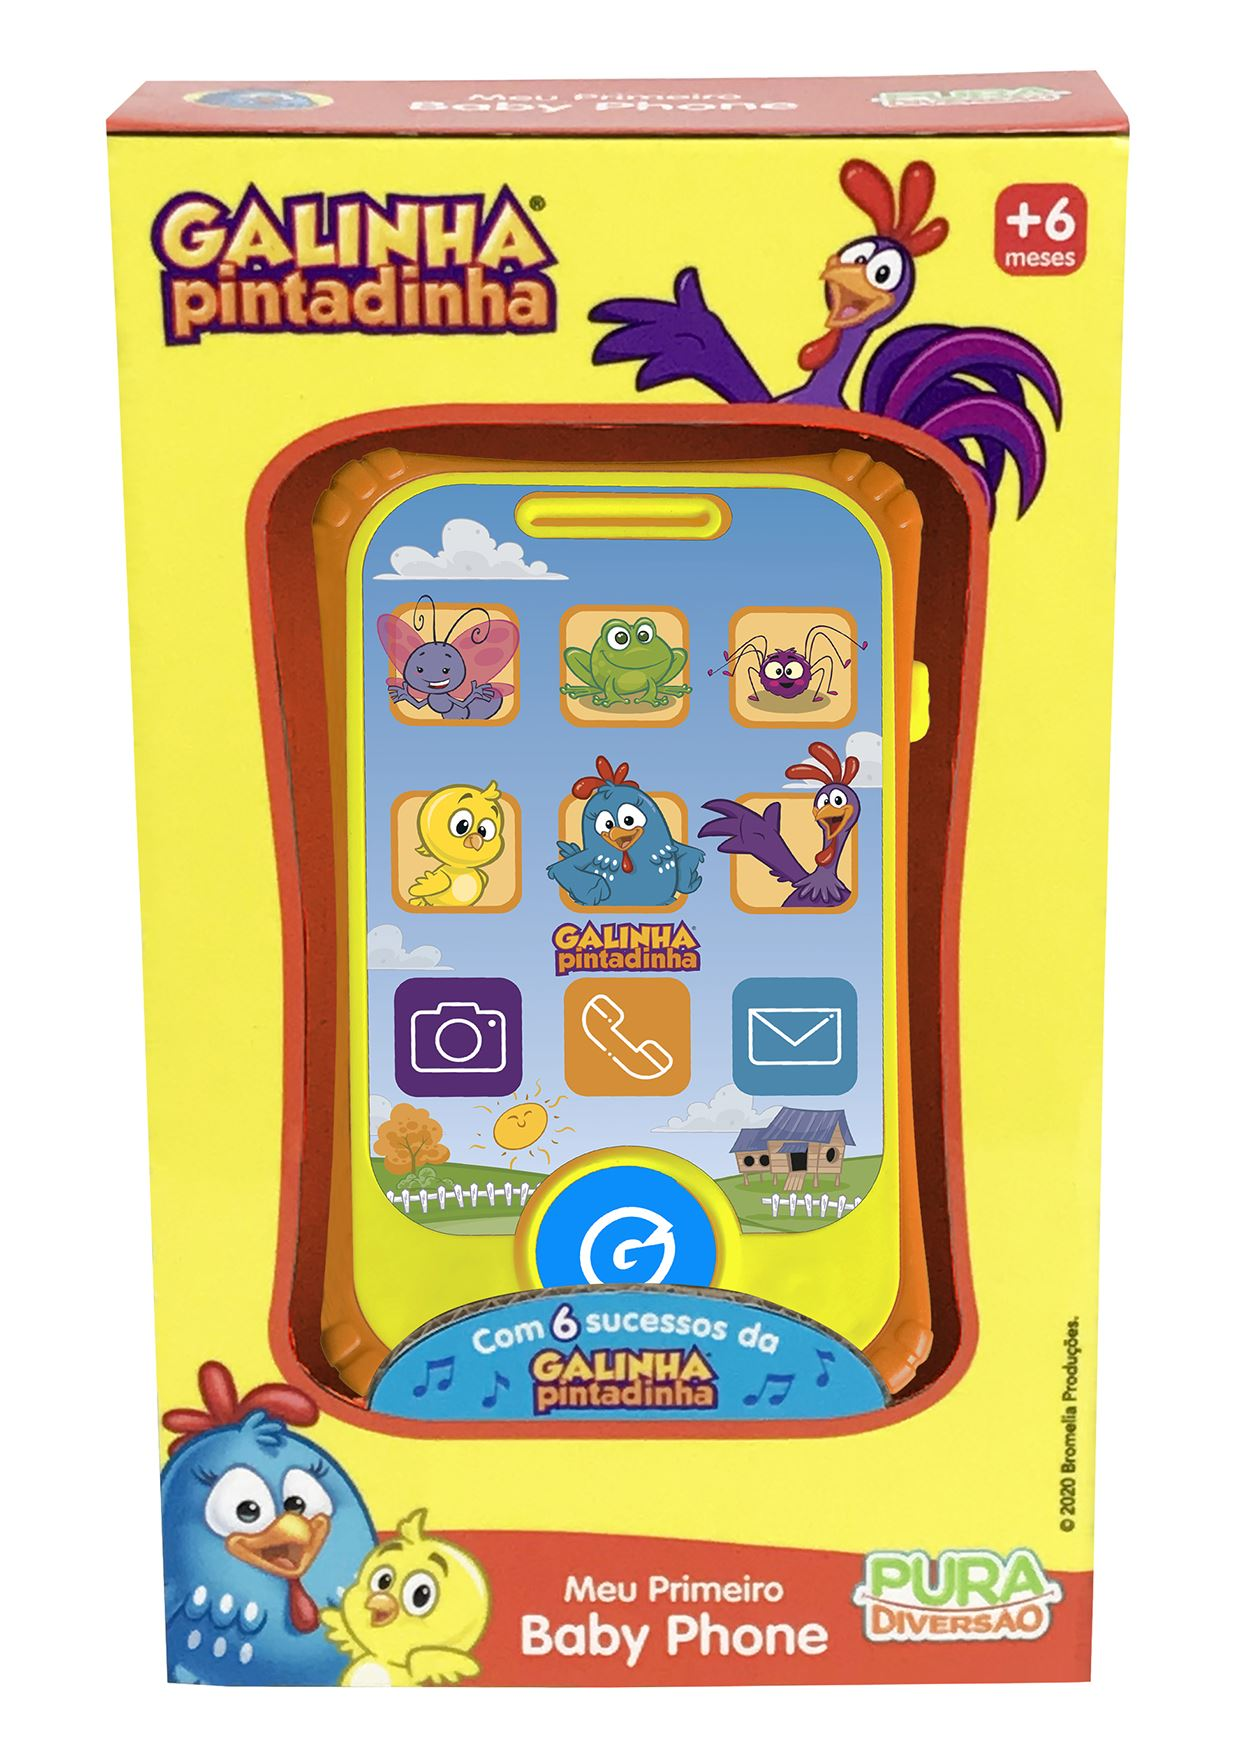 Meu Primeiro Baby Phone - Galinha Pintadinha - Yes Toys